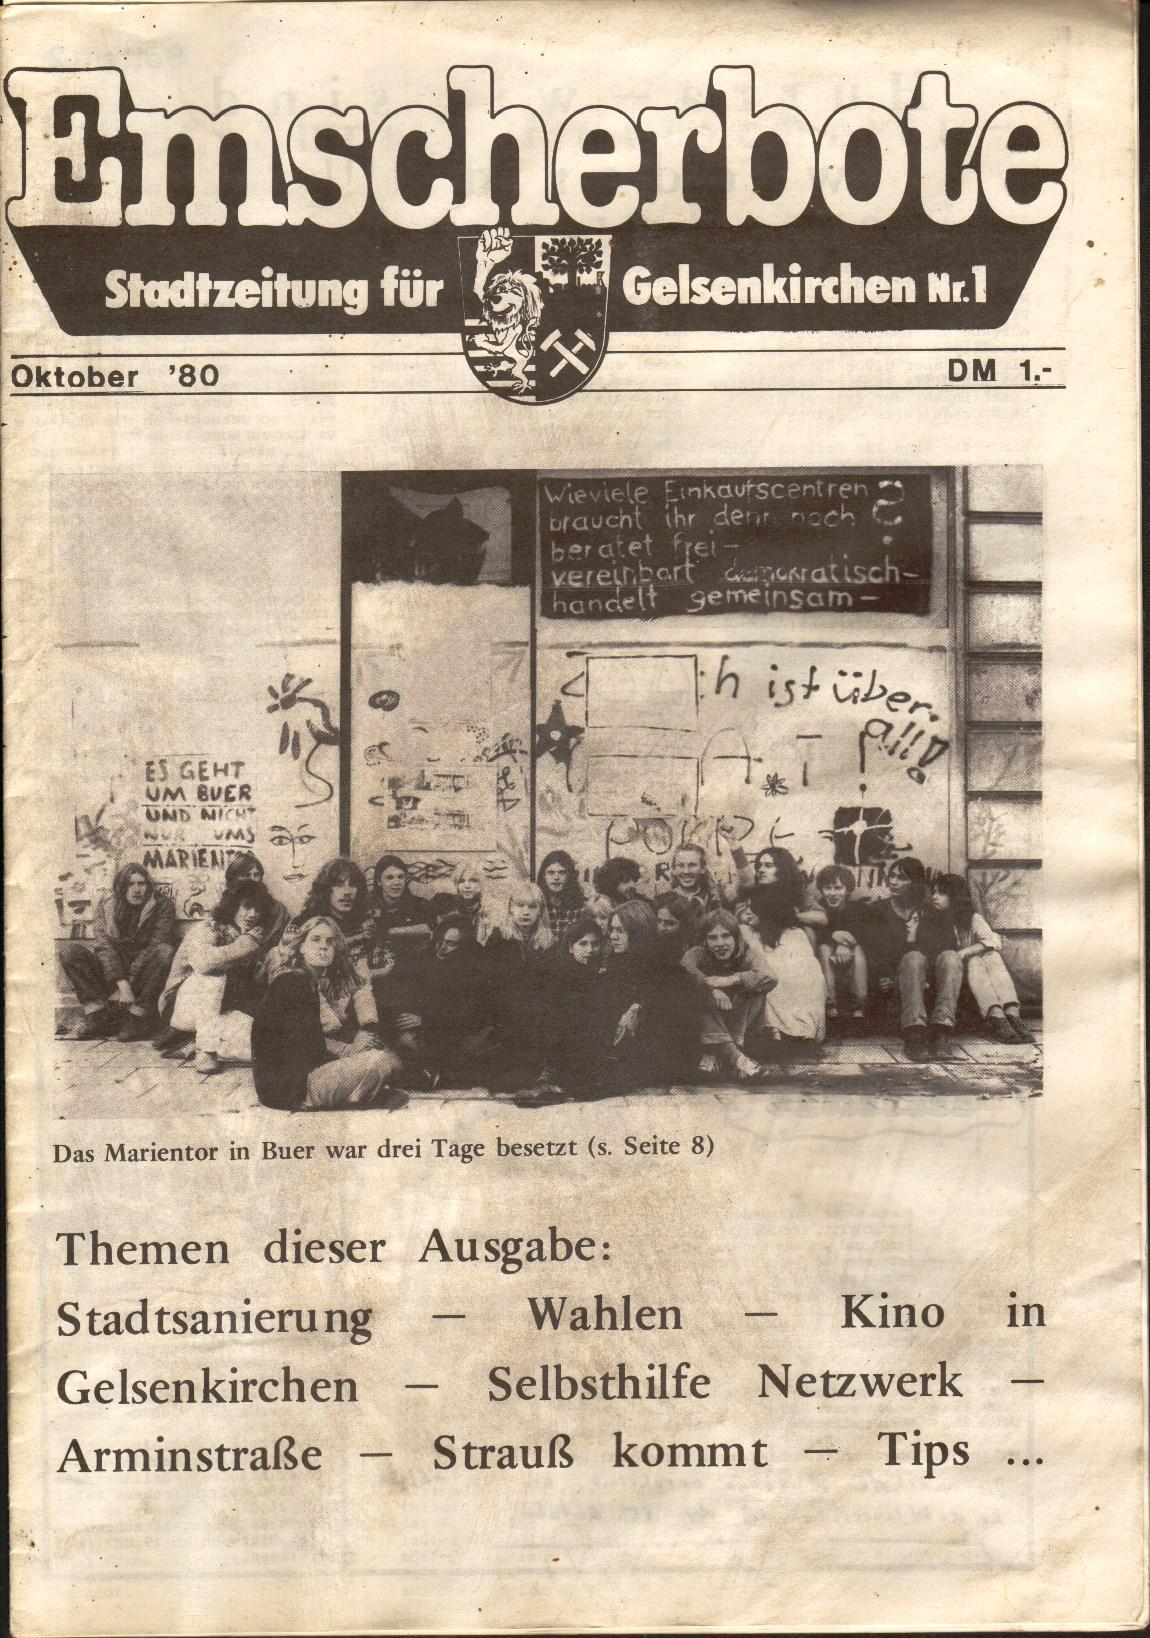 Gelsenkirchen_Emscherbote_1980_01_01